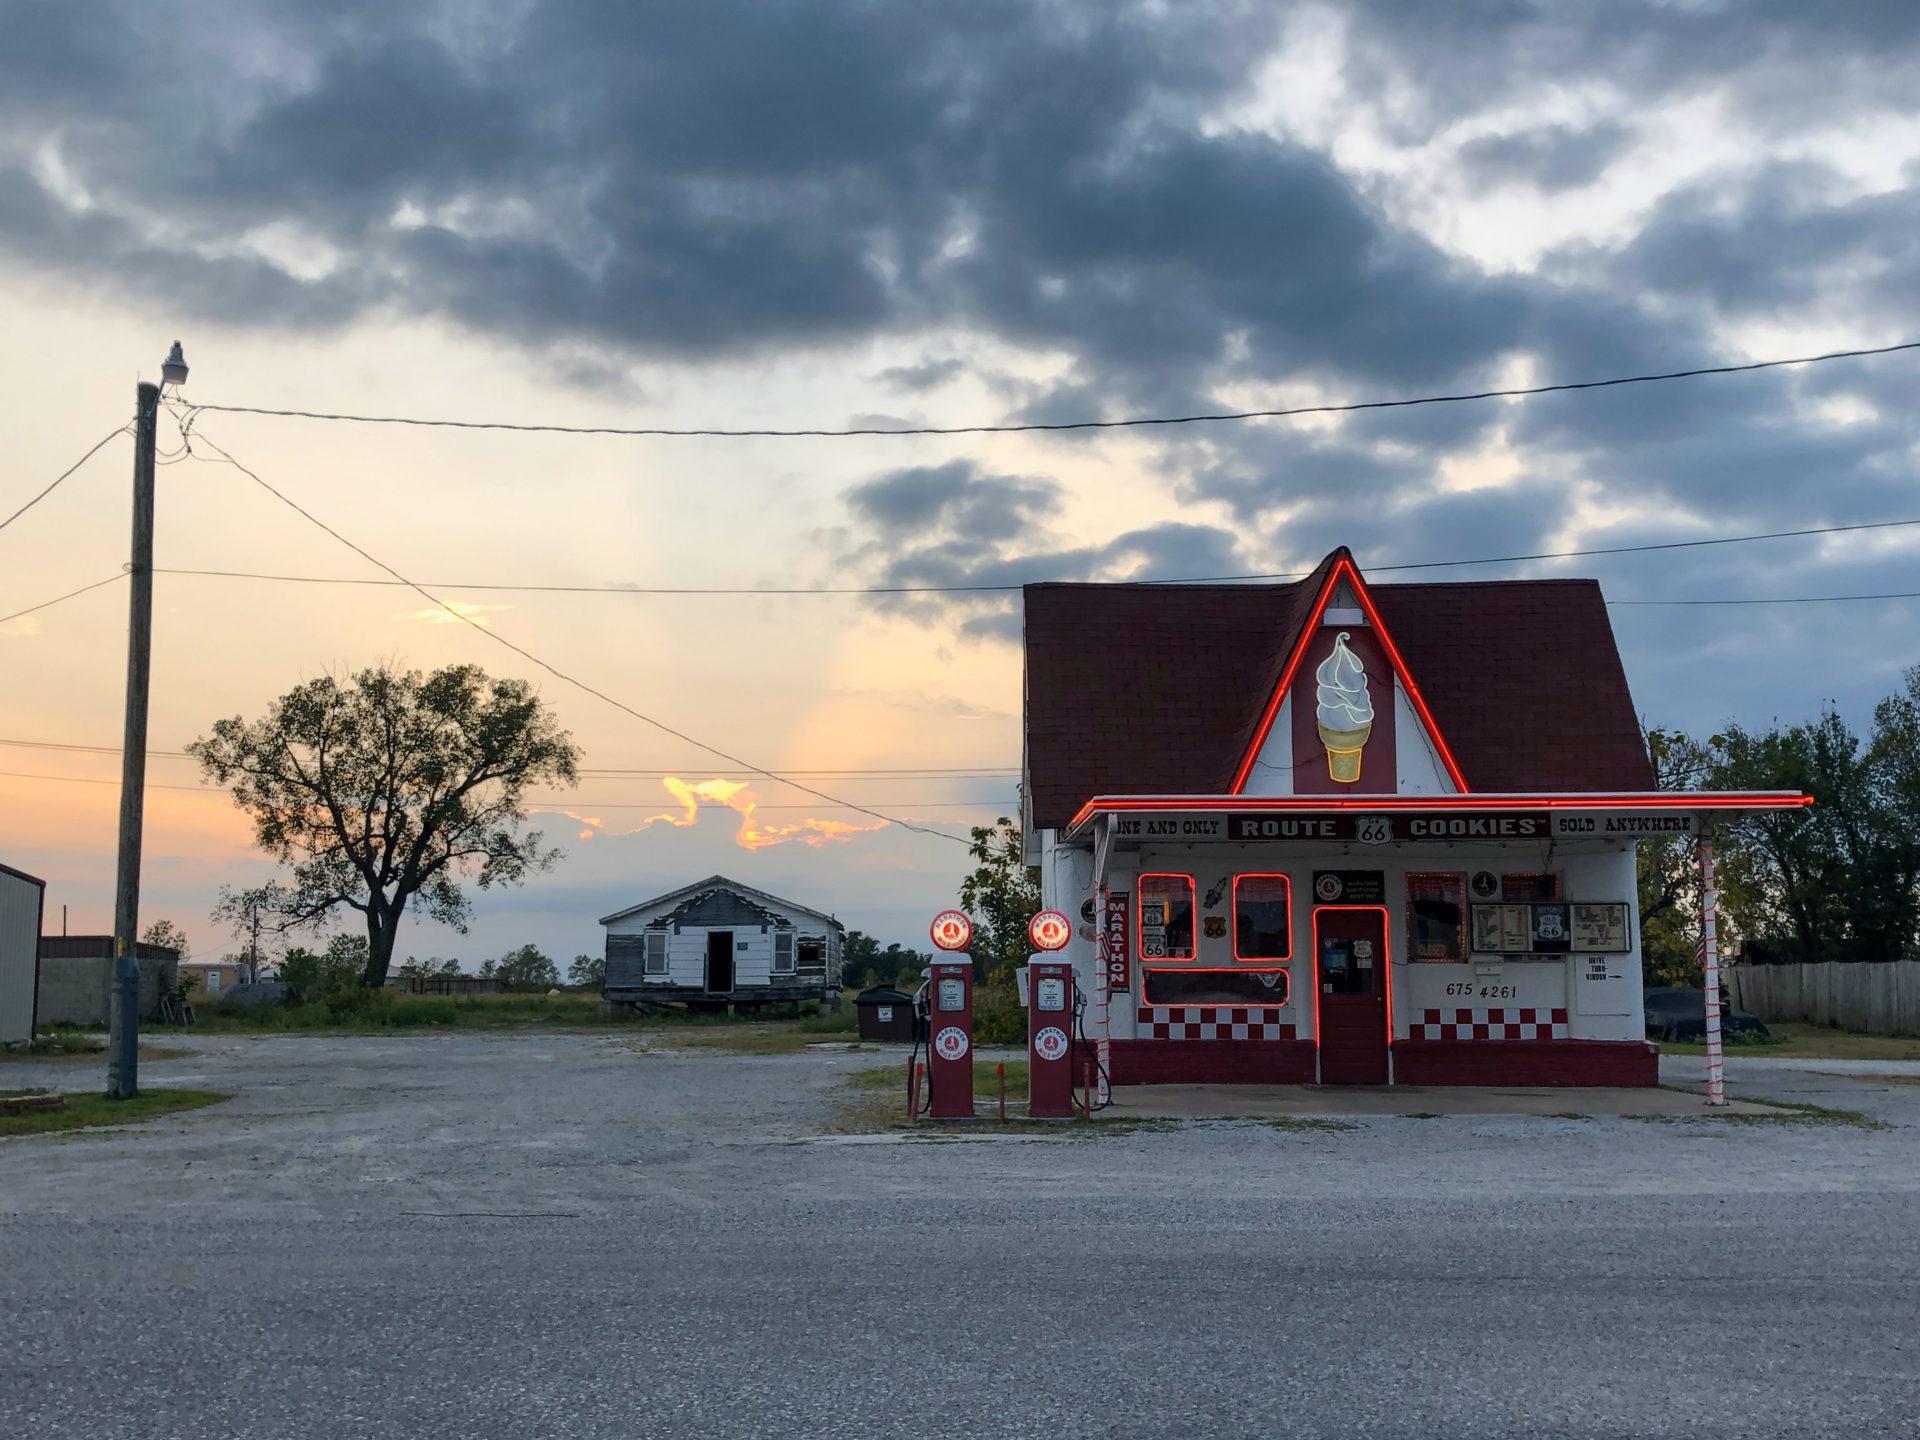 Marathon-Tankstelle an der Route 66 in Commerce, Oklahoma.